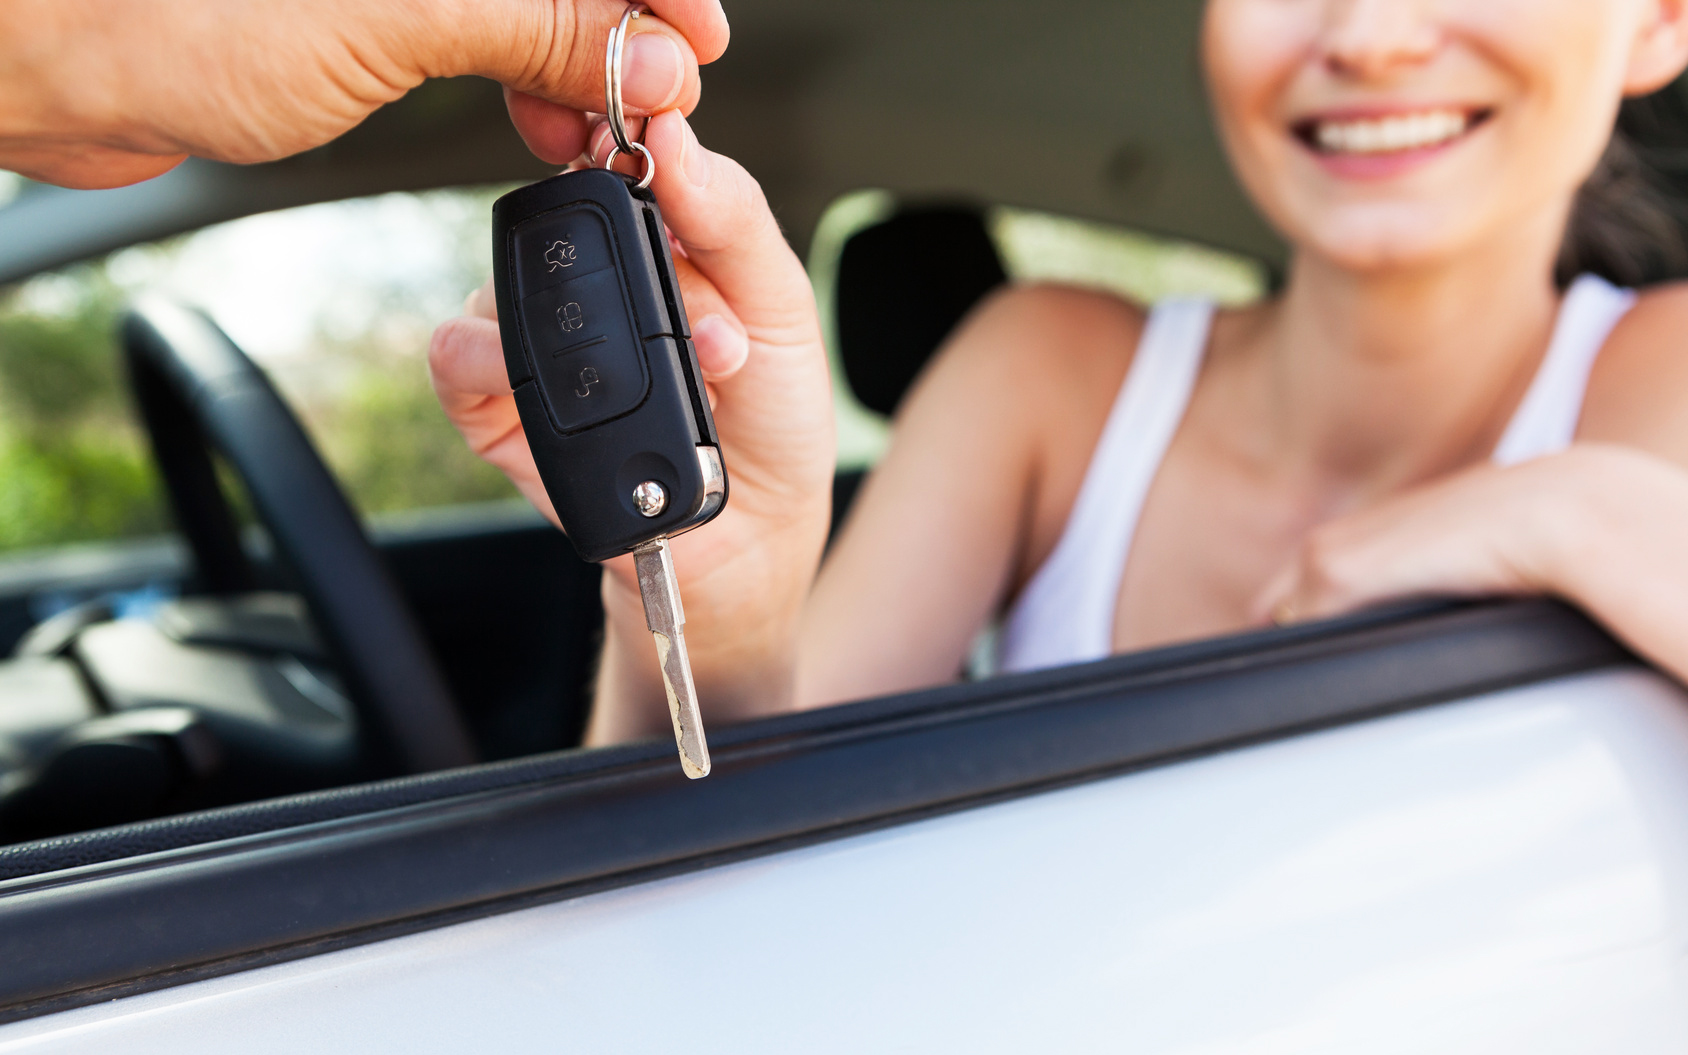 Autoscuola Riccetti Esami di guida in sede